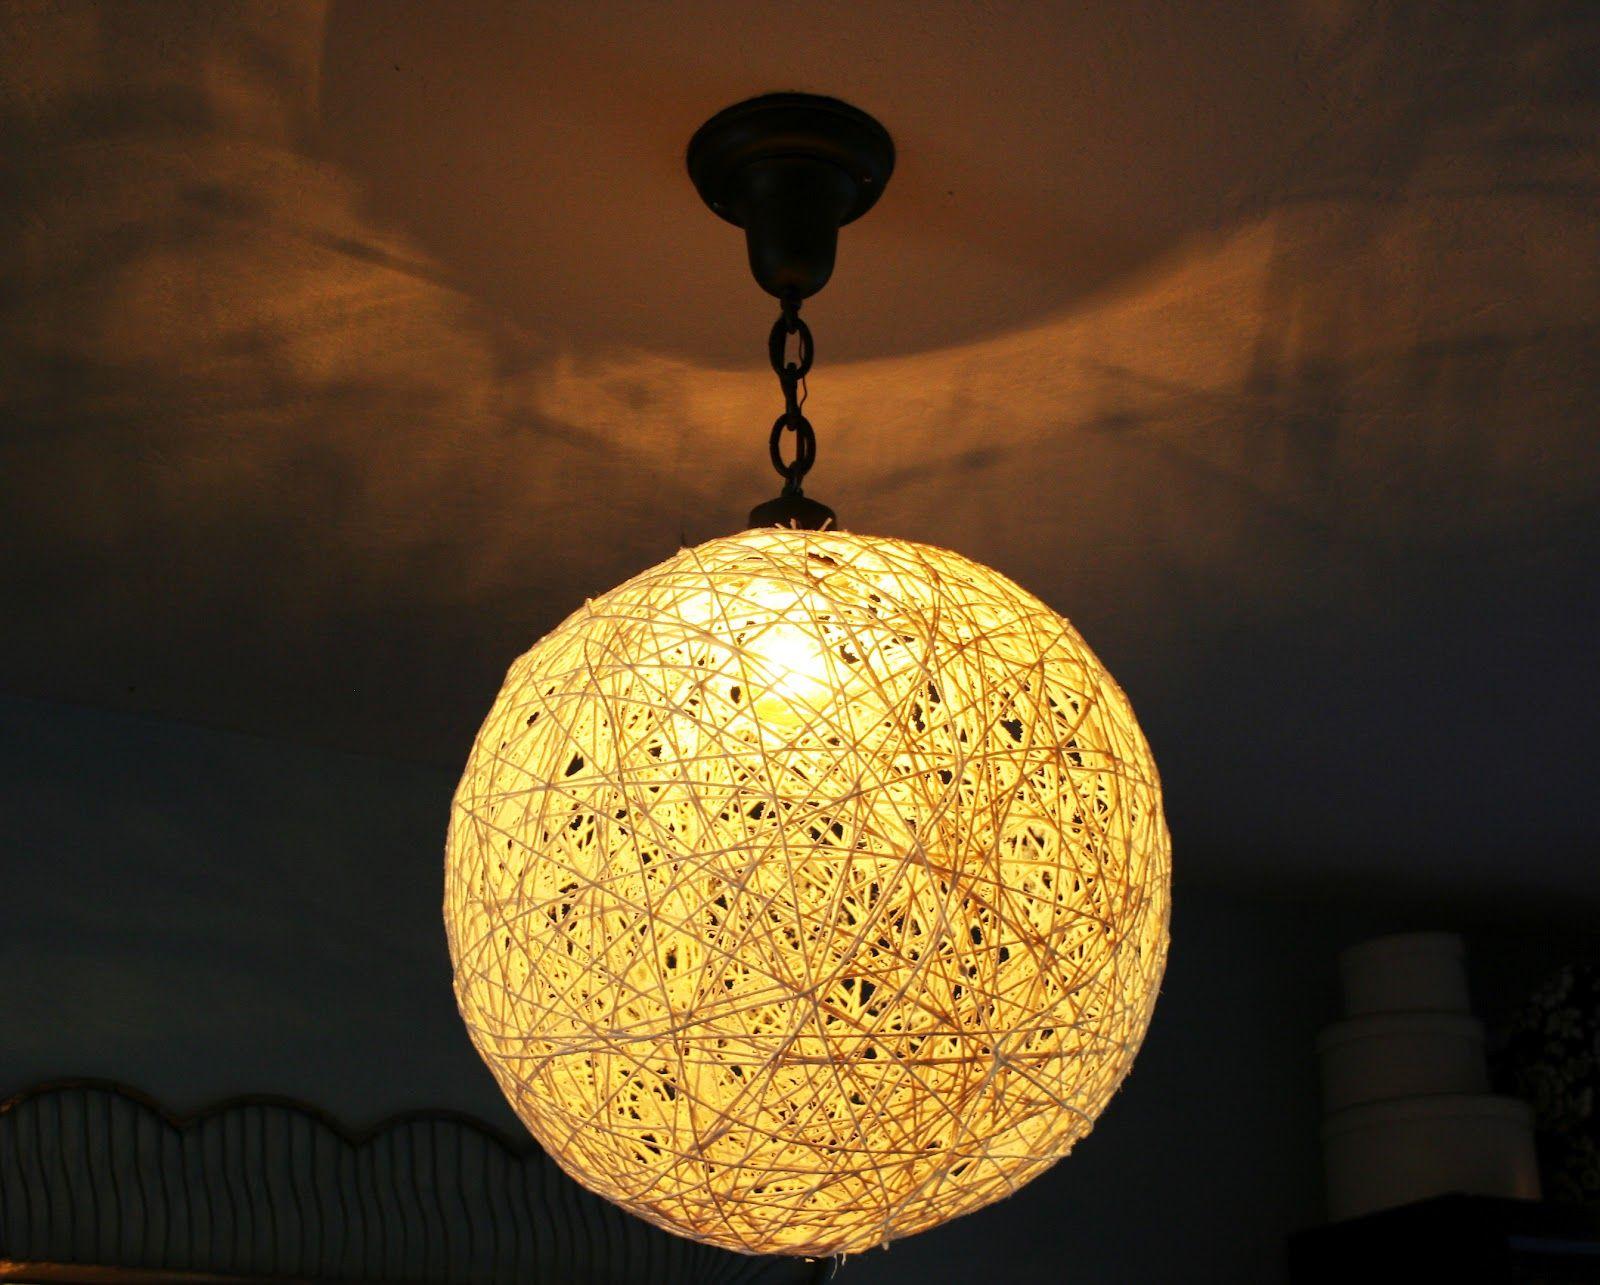 Pin By Paul Hersey On Illumination Ideas Diy Home Decor Diy